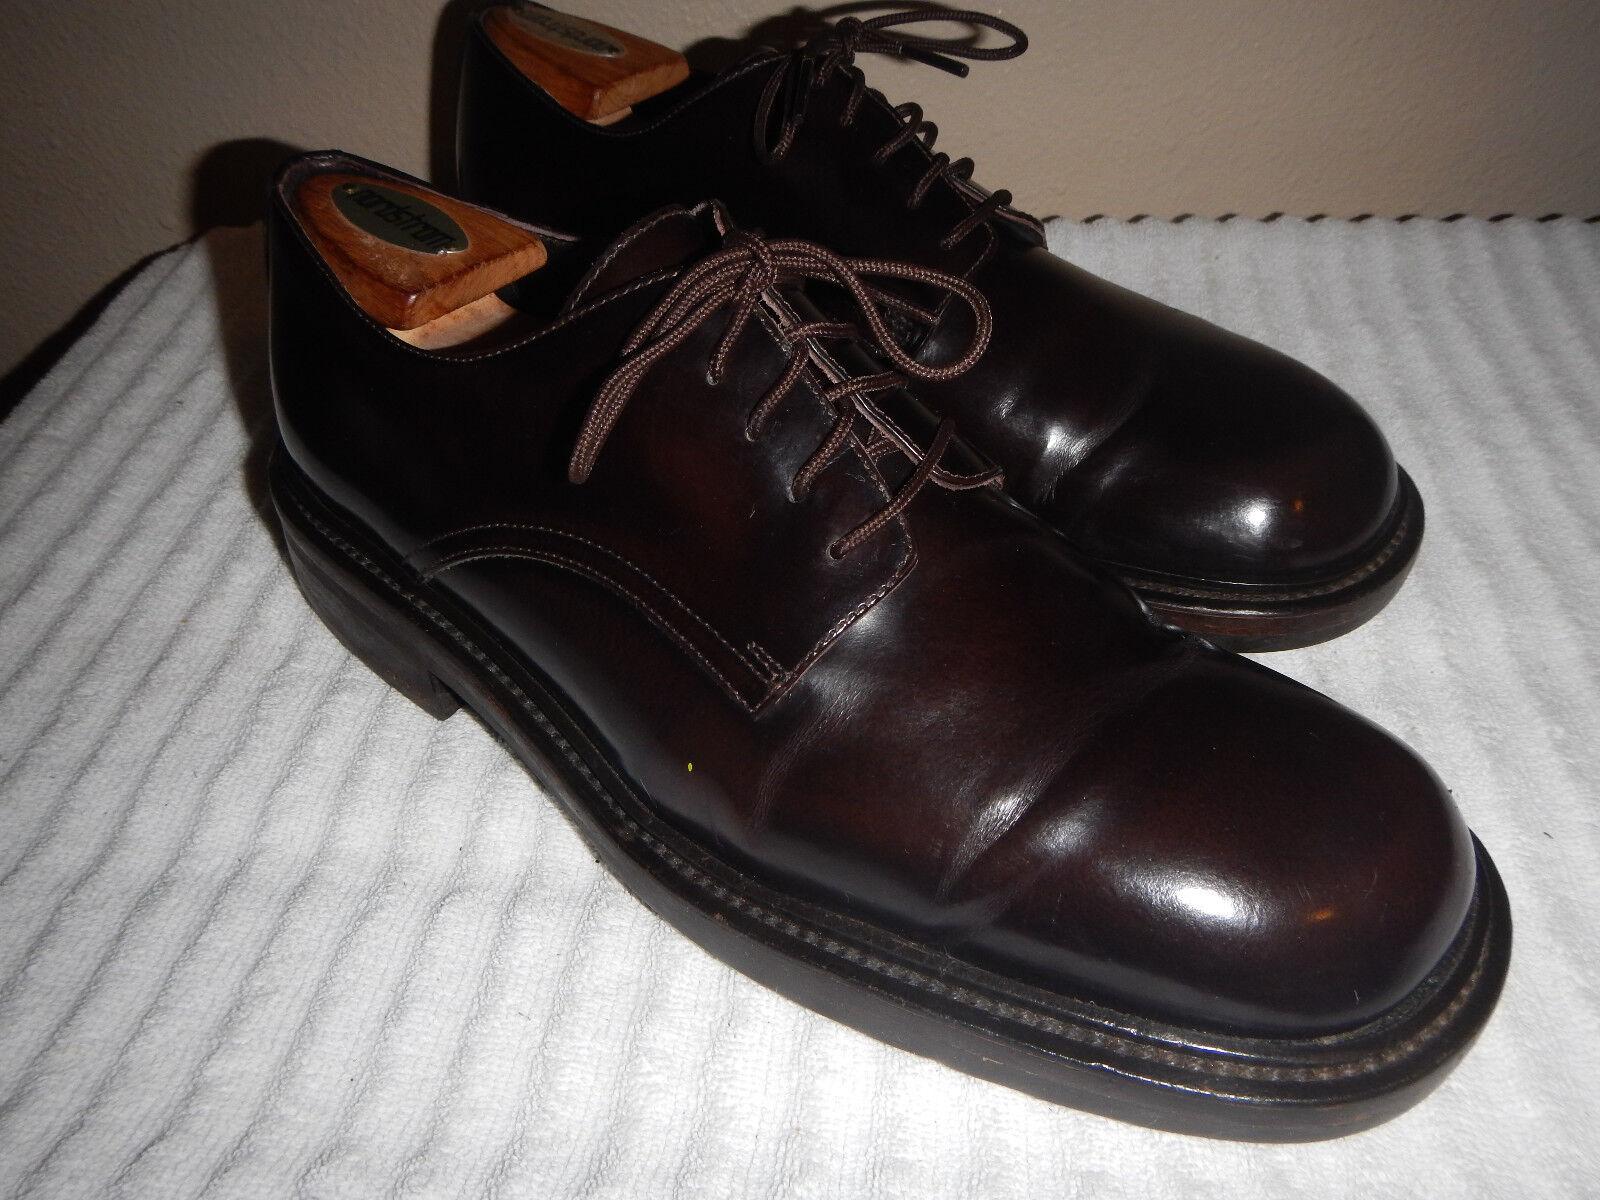 J Crew Men's Plain Toe bluecher Dress shoes Dark Brown Leather  9 M